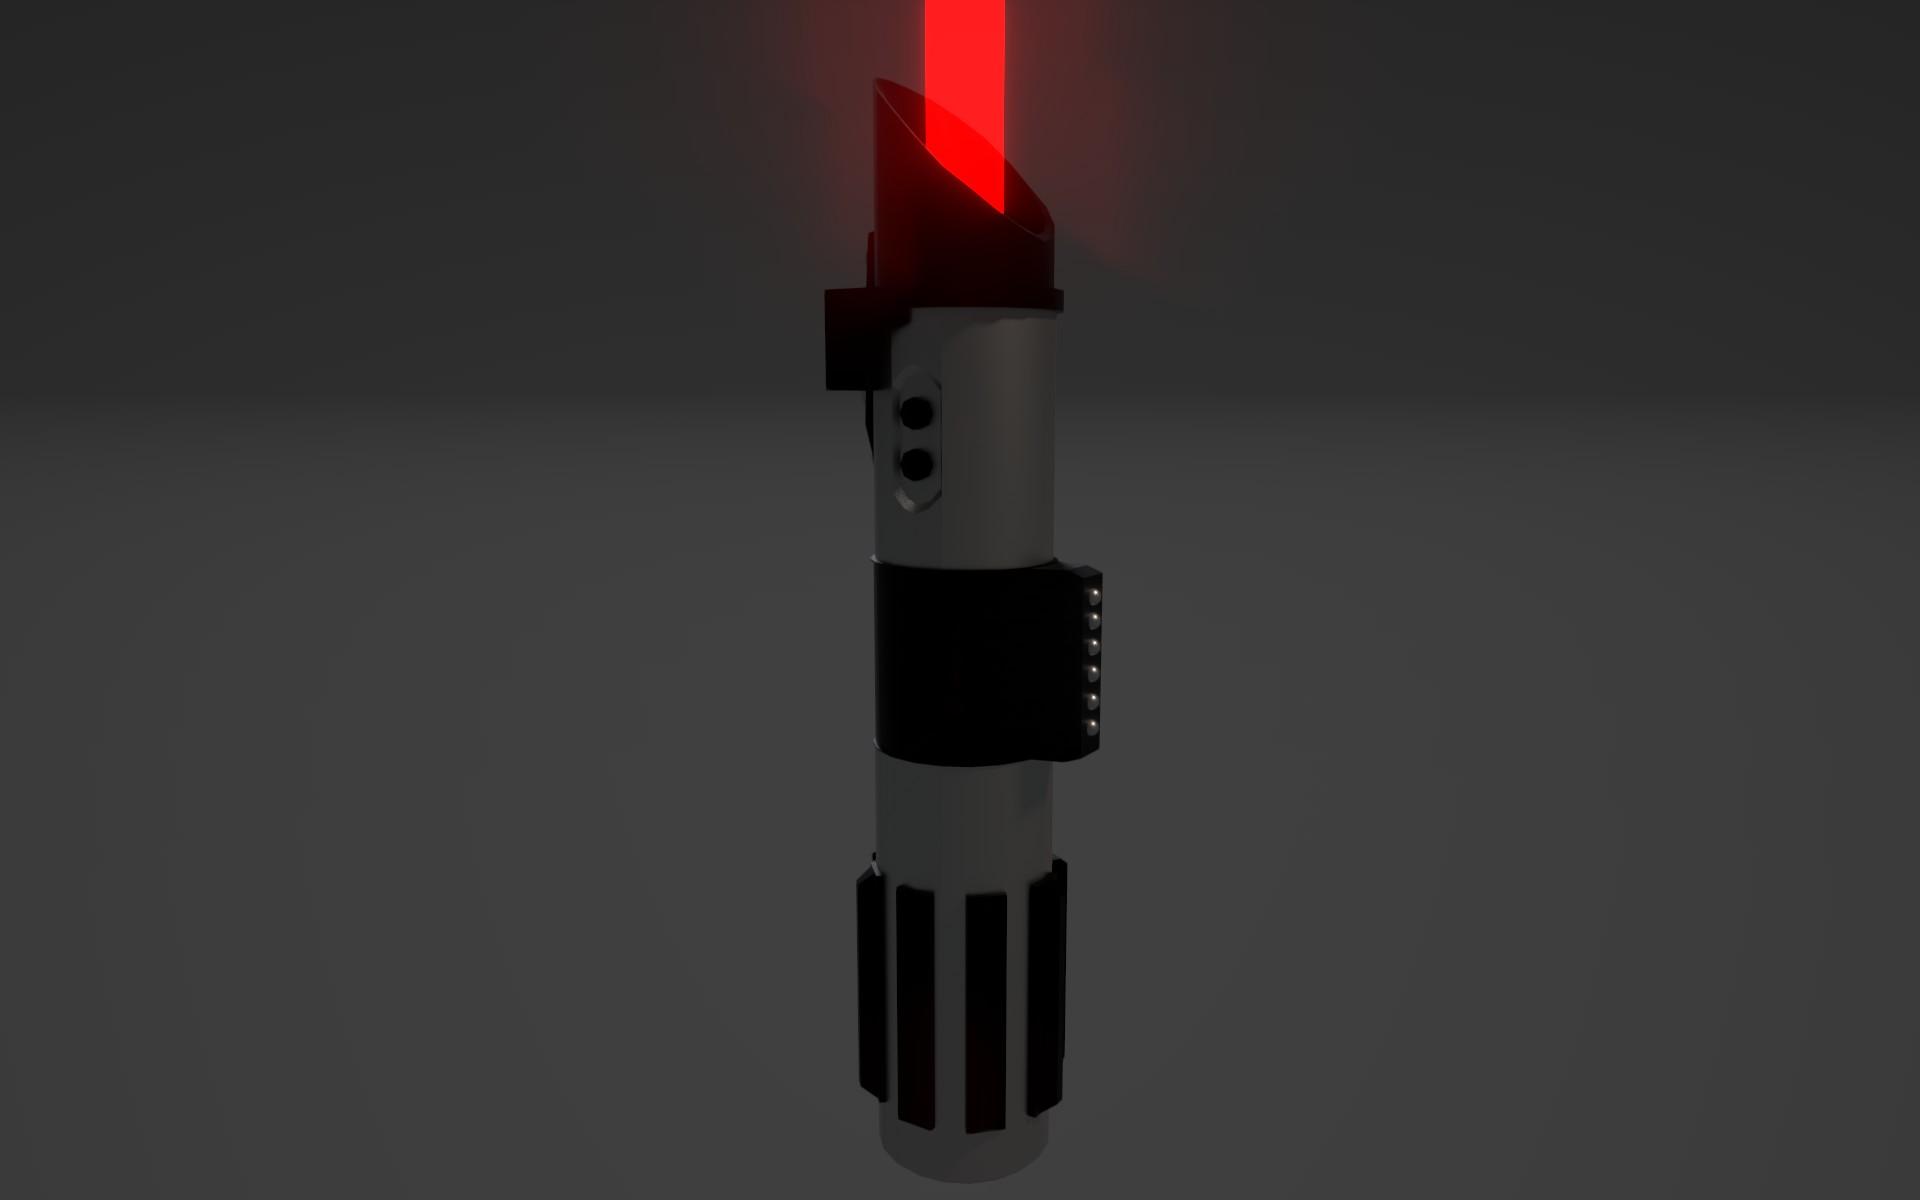 Darth Vader's Saber Close up 2 by planetrix15